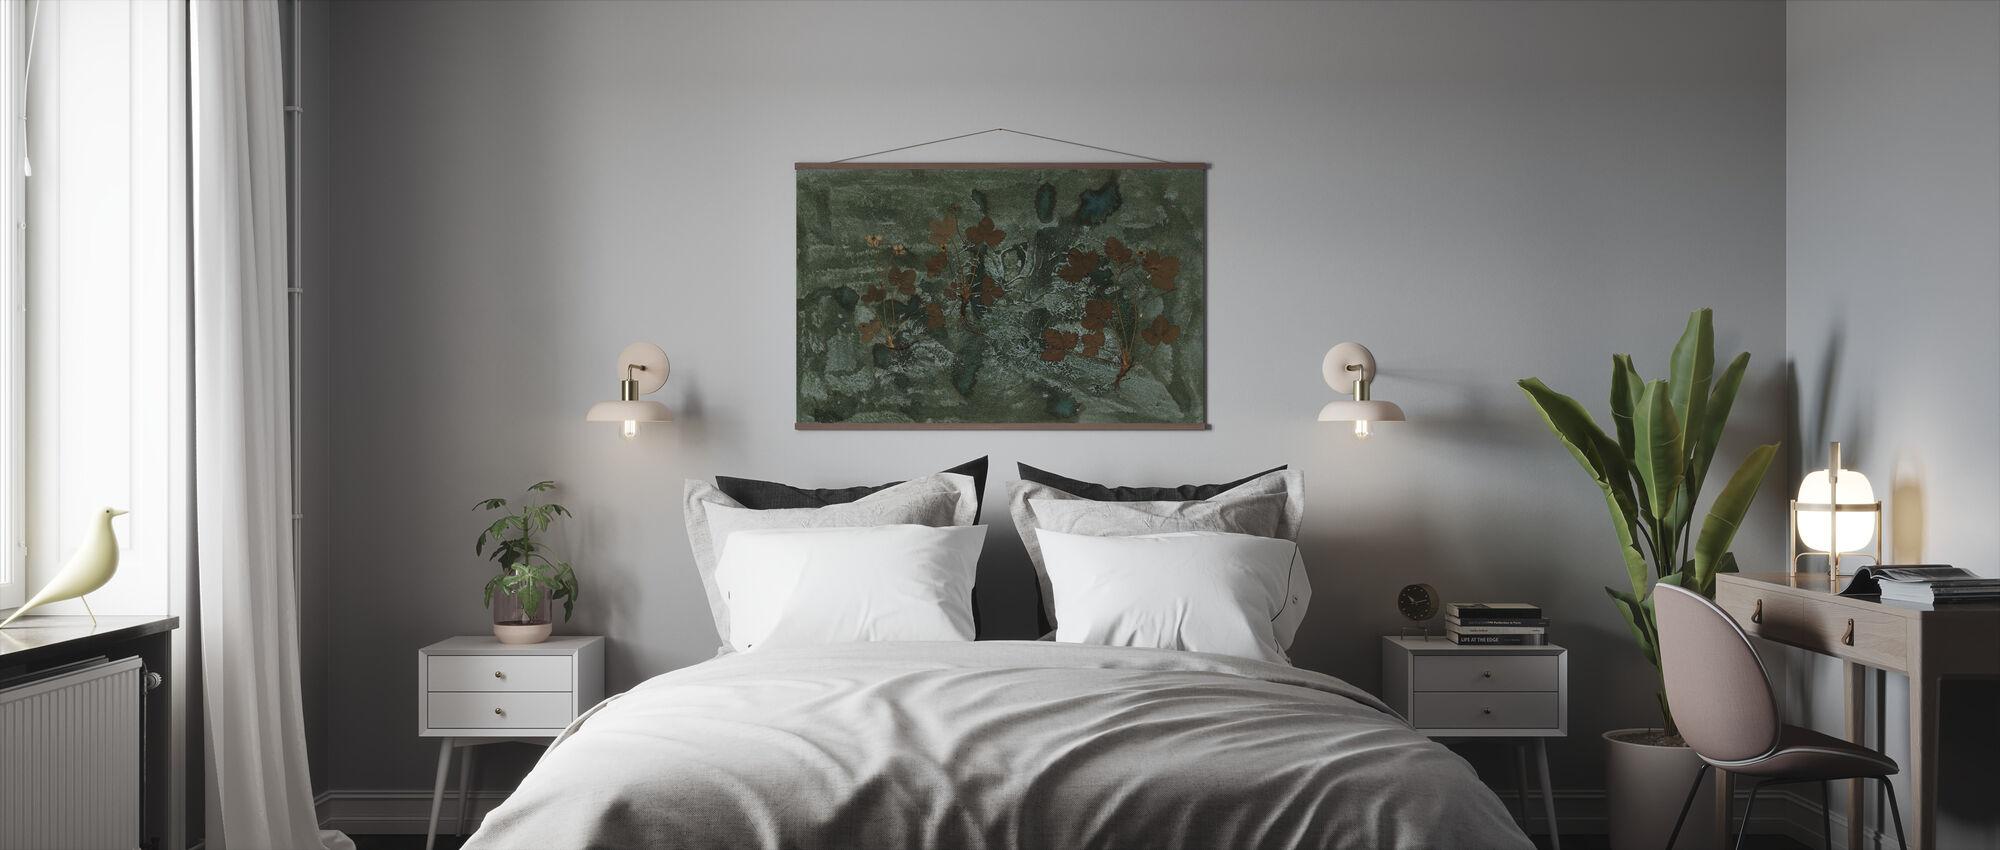 Bibi - Poster - Bedroom